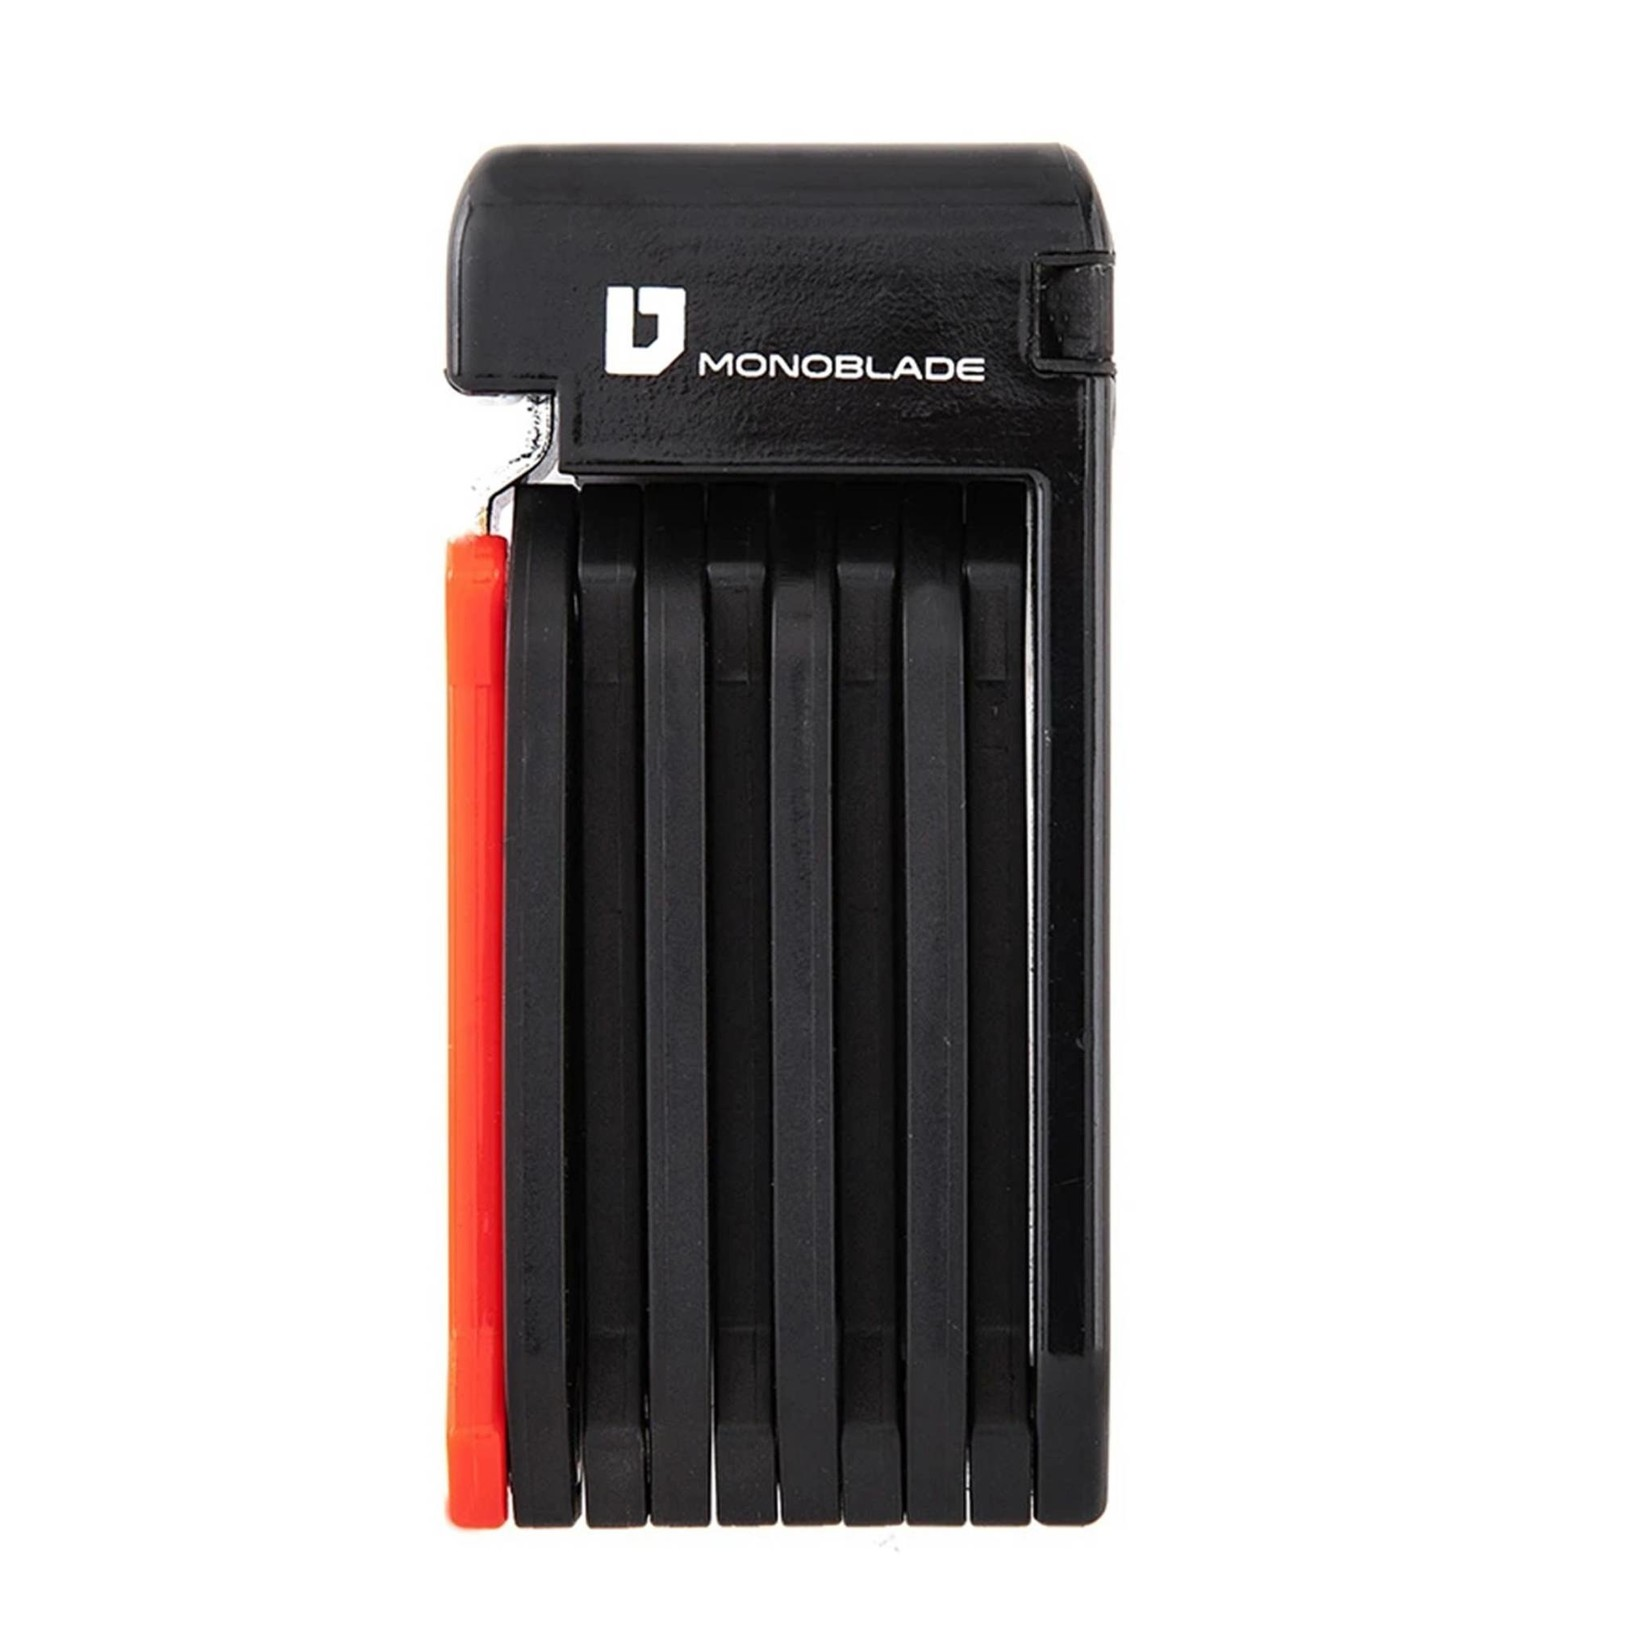 ULAC Monoblade Steel Folding Lock Lvl4